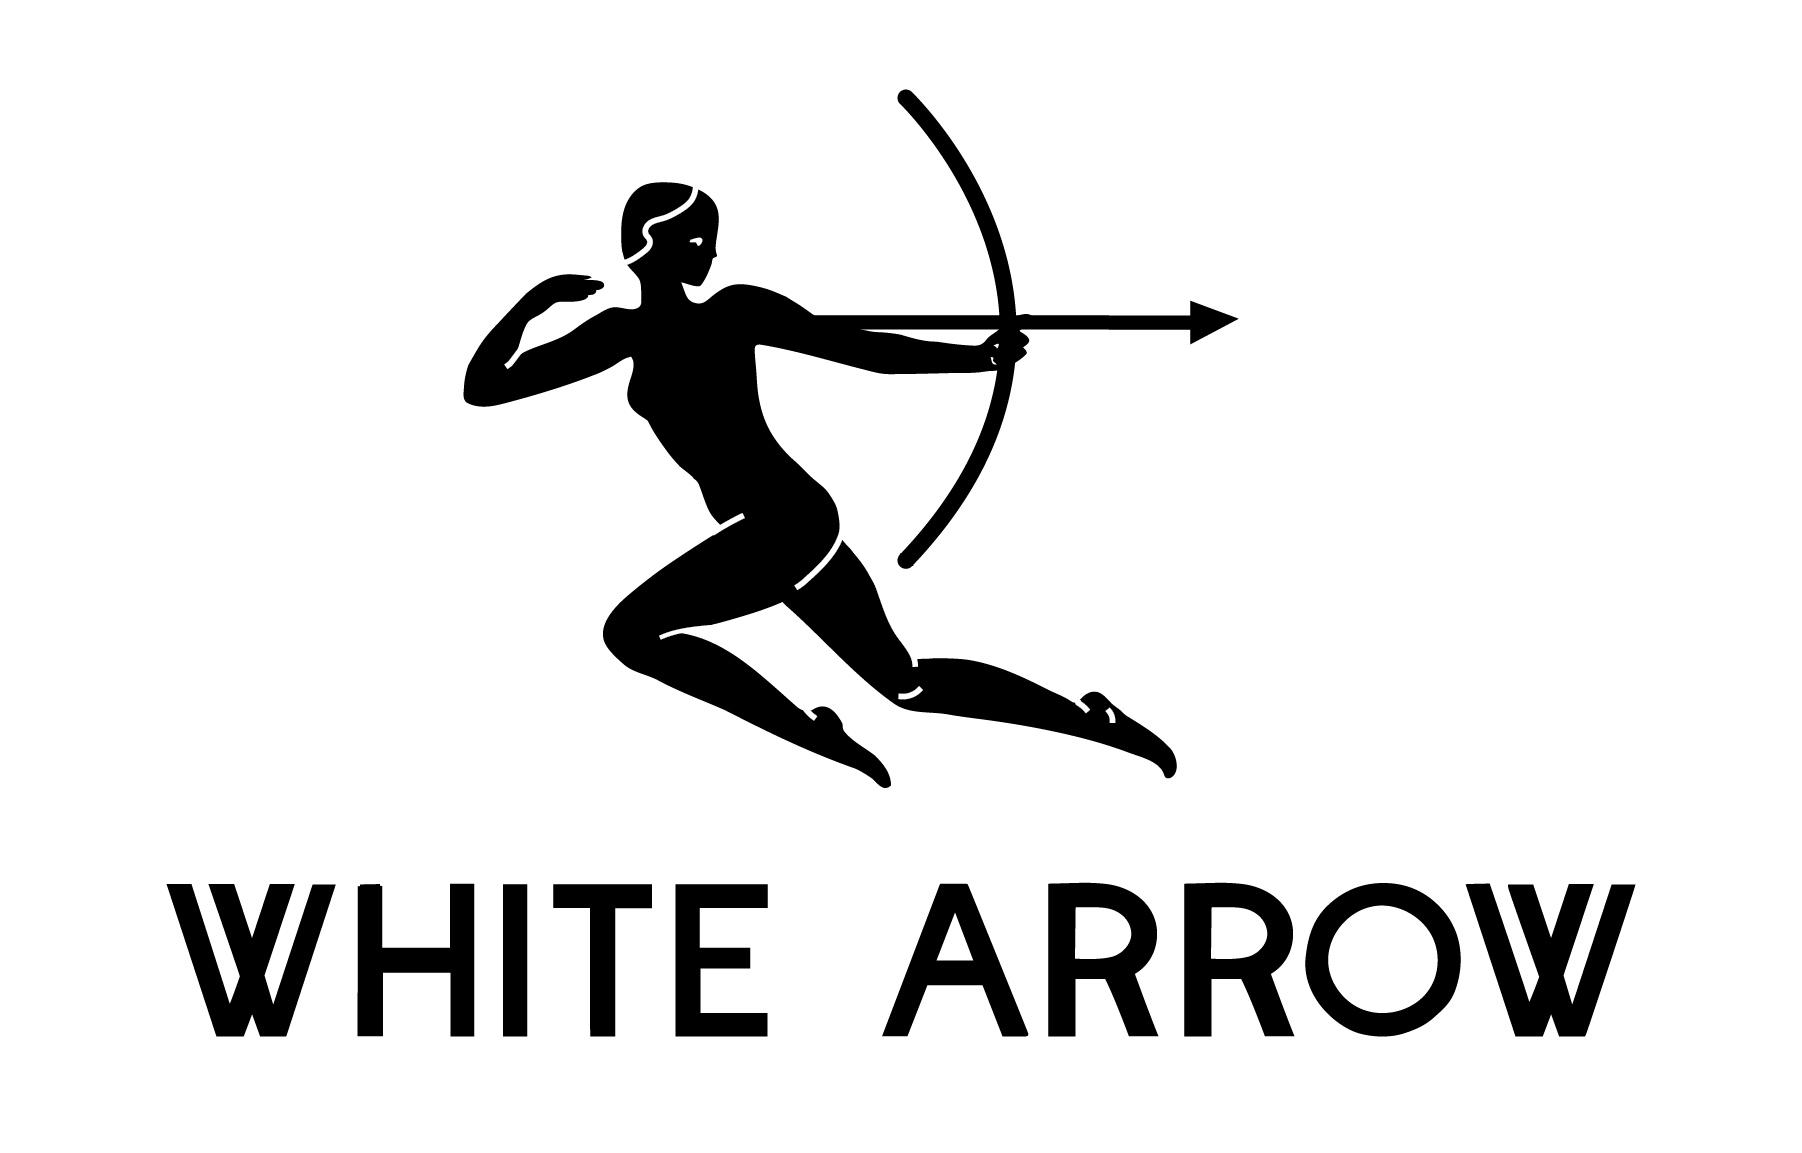 white_arrow_logo_01-01.jpg